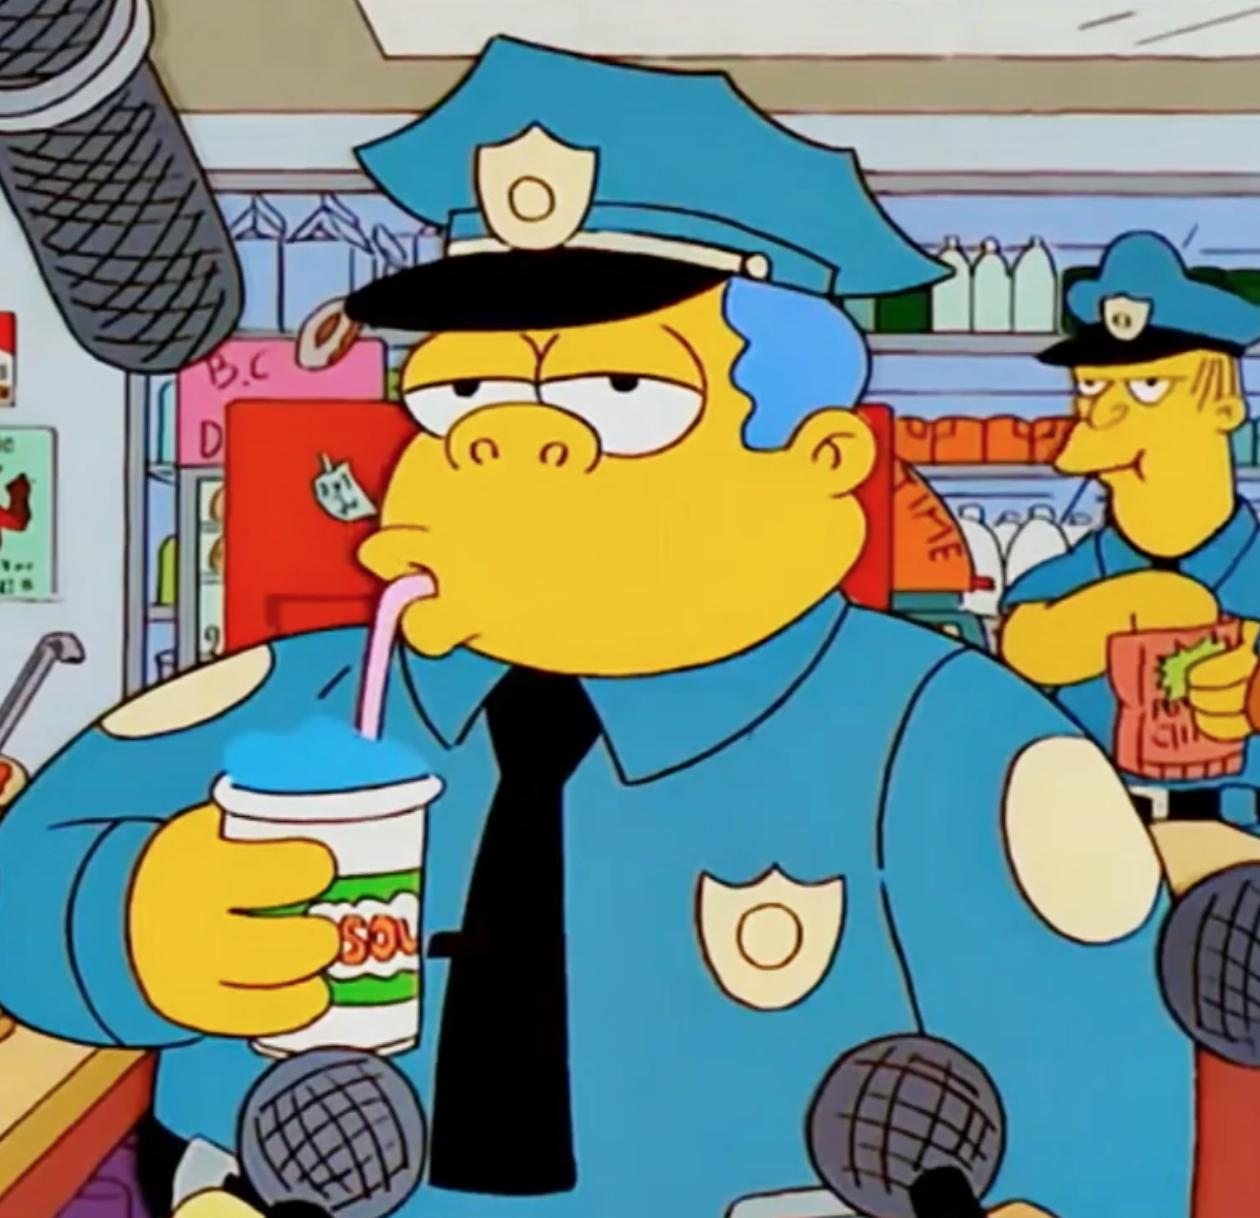 Police Chief Wiggum